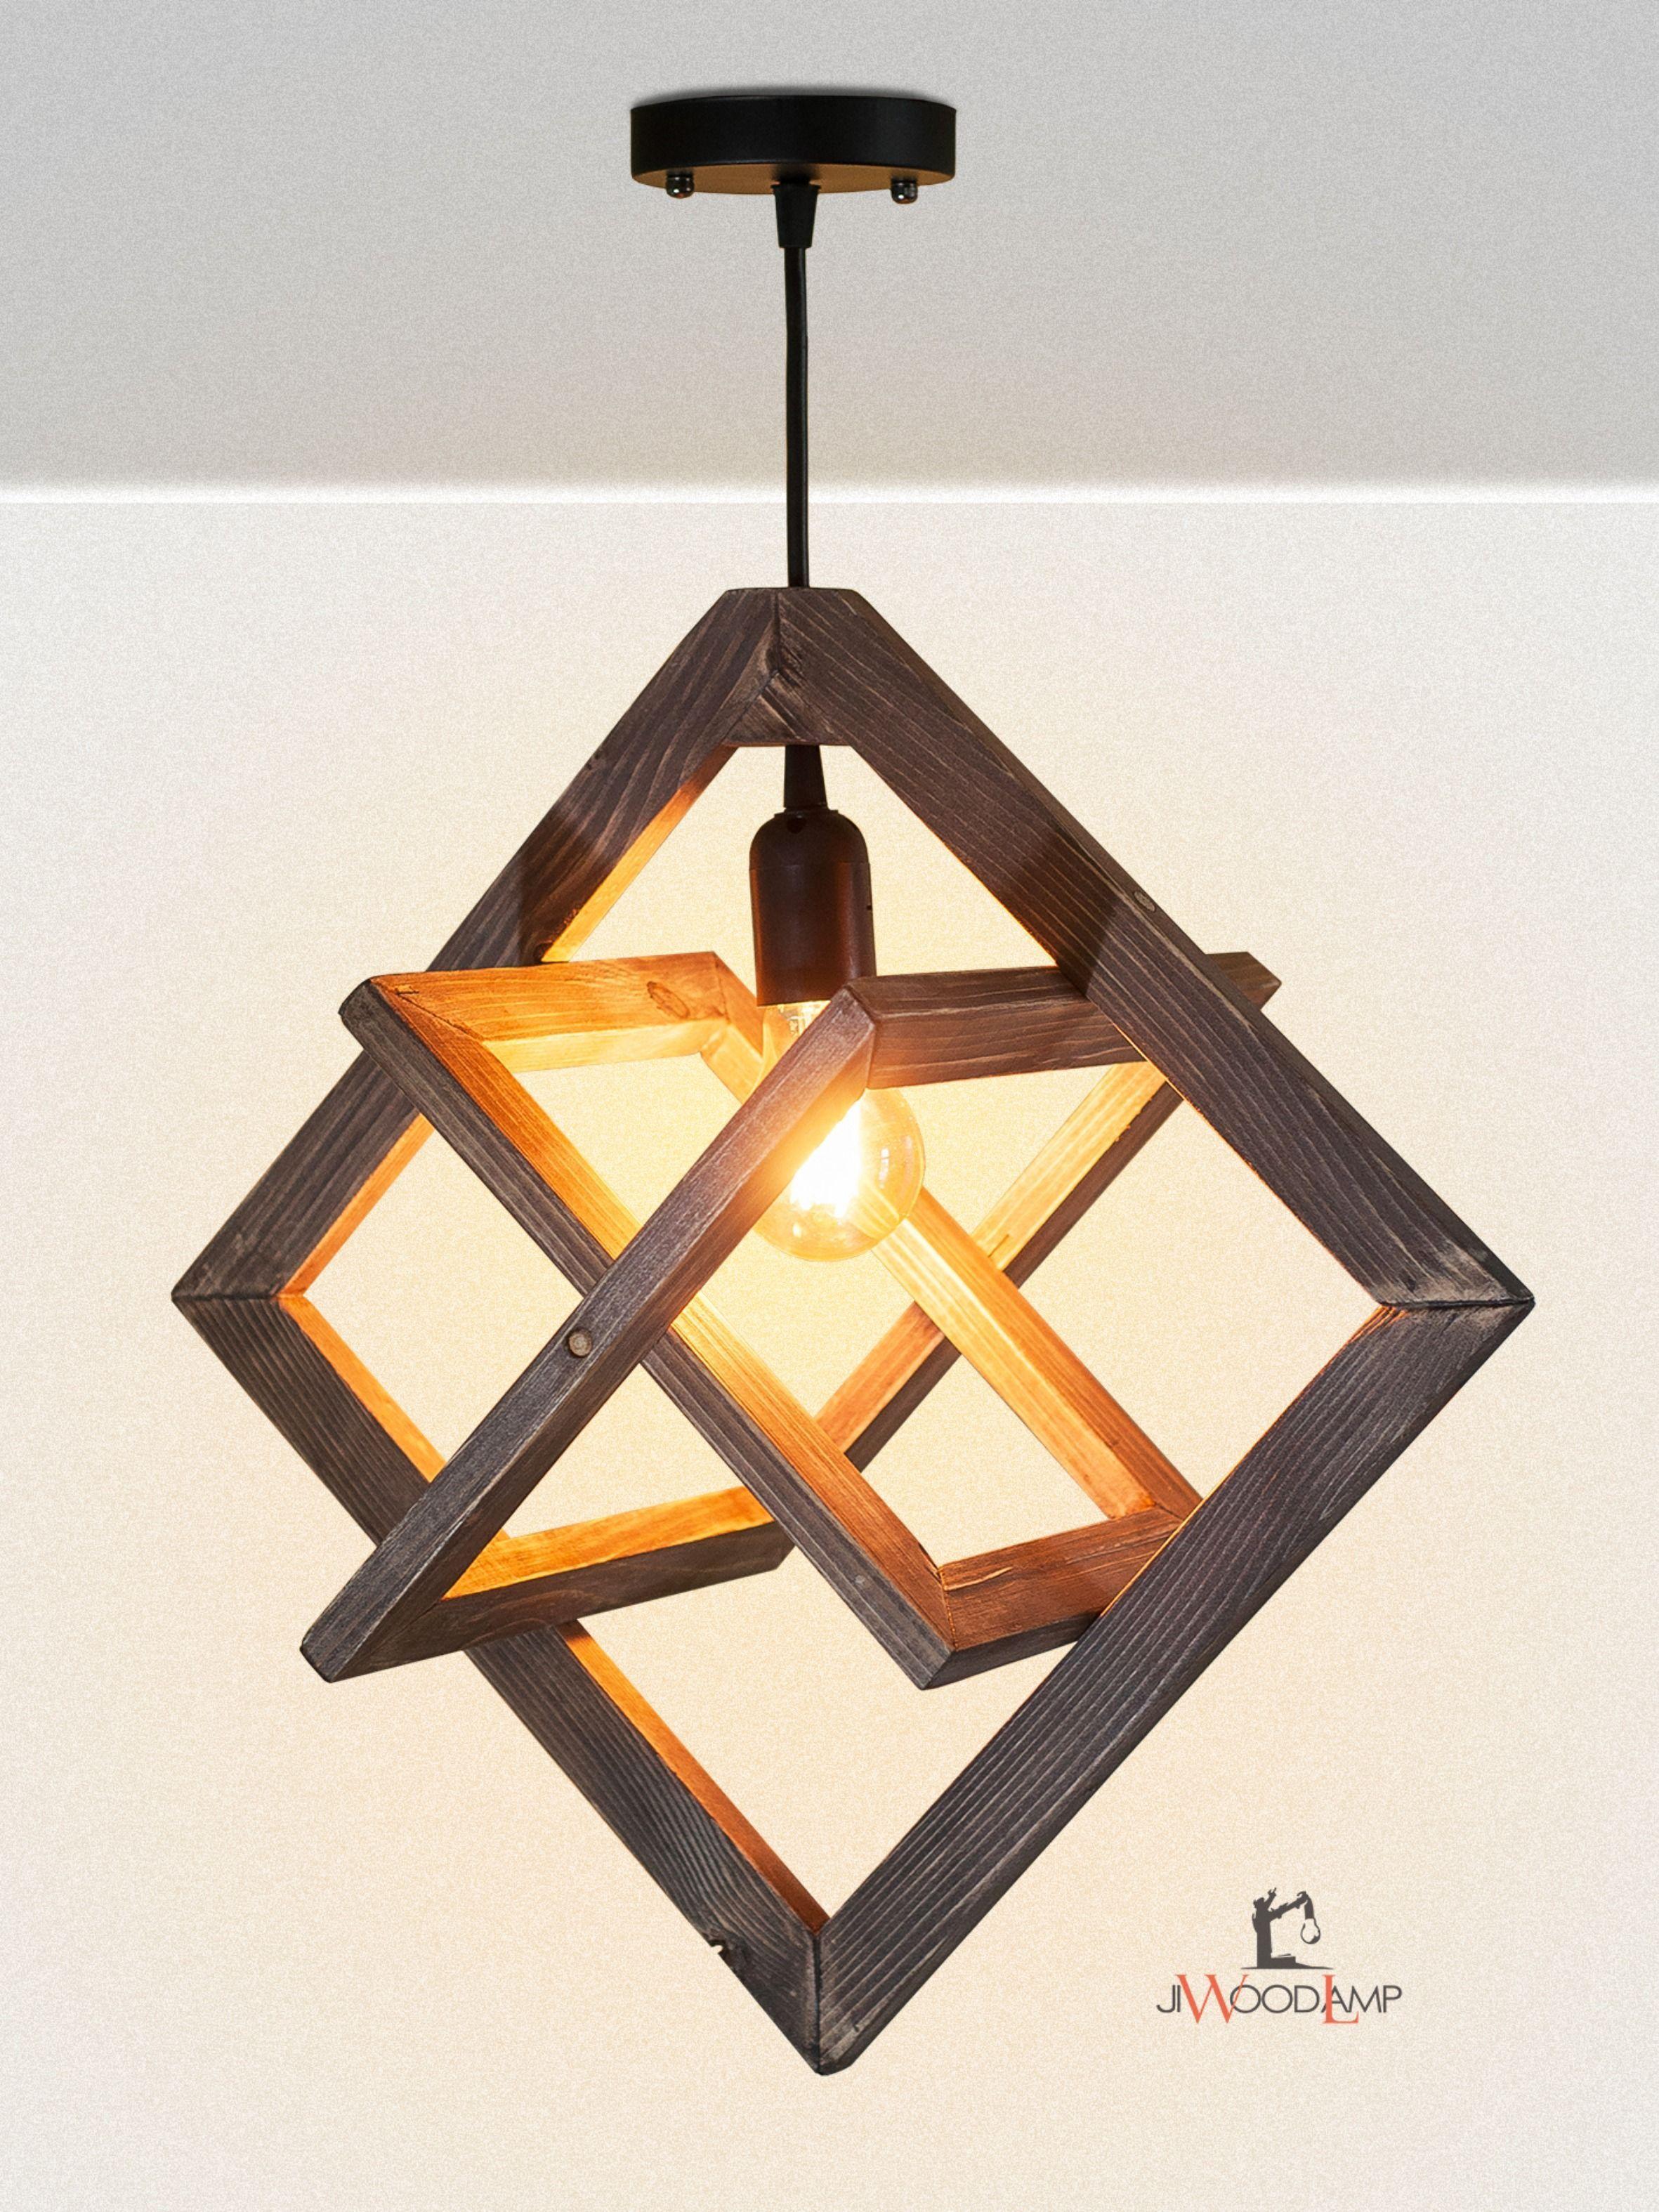 Coastal decor #wooden #Light #design wooden Light design, building